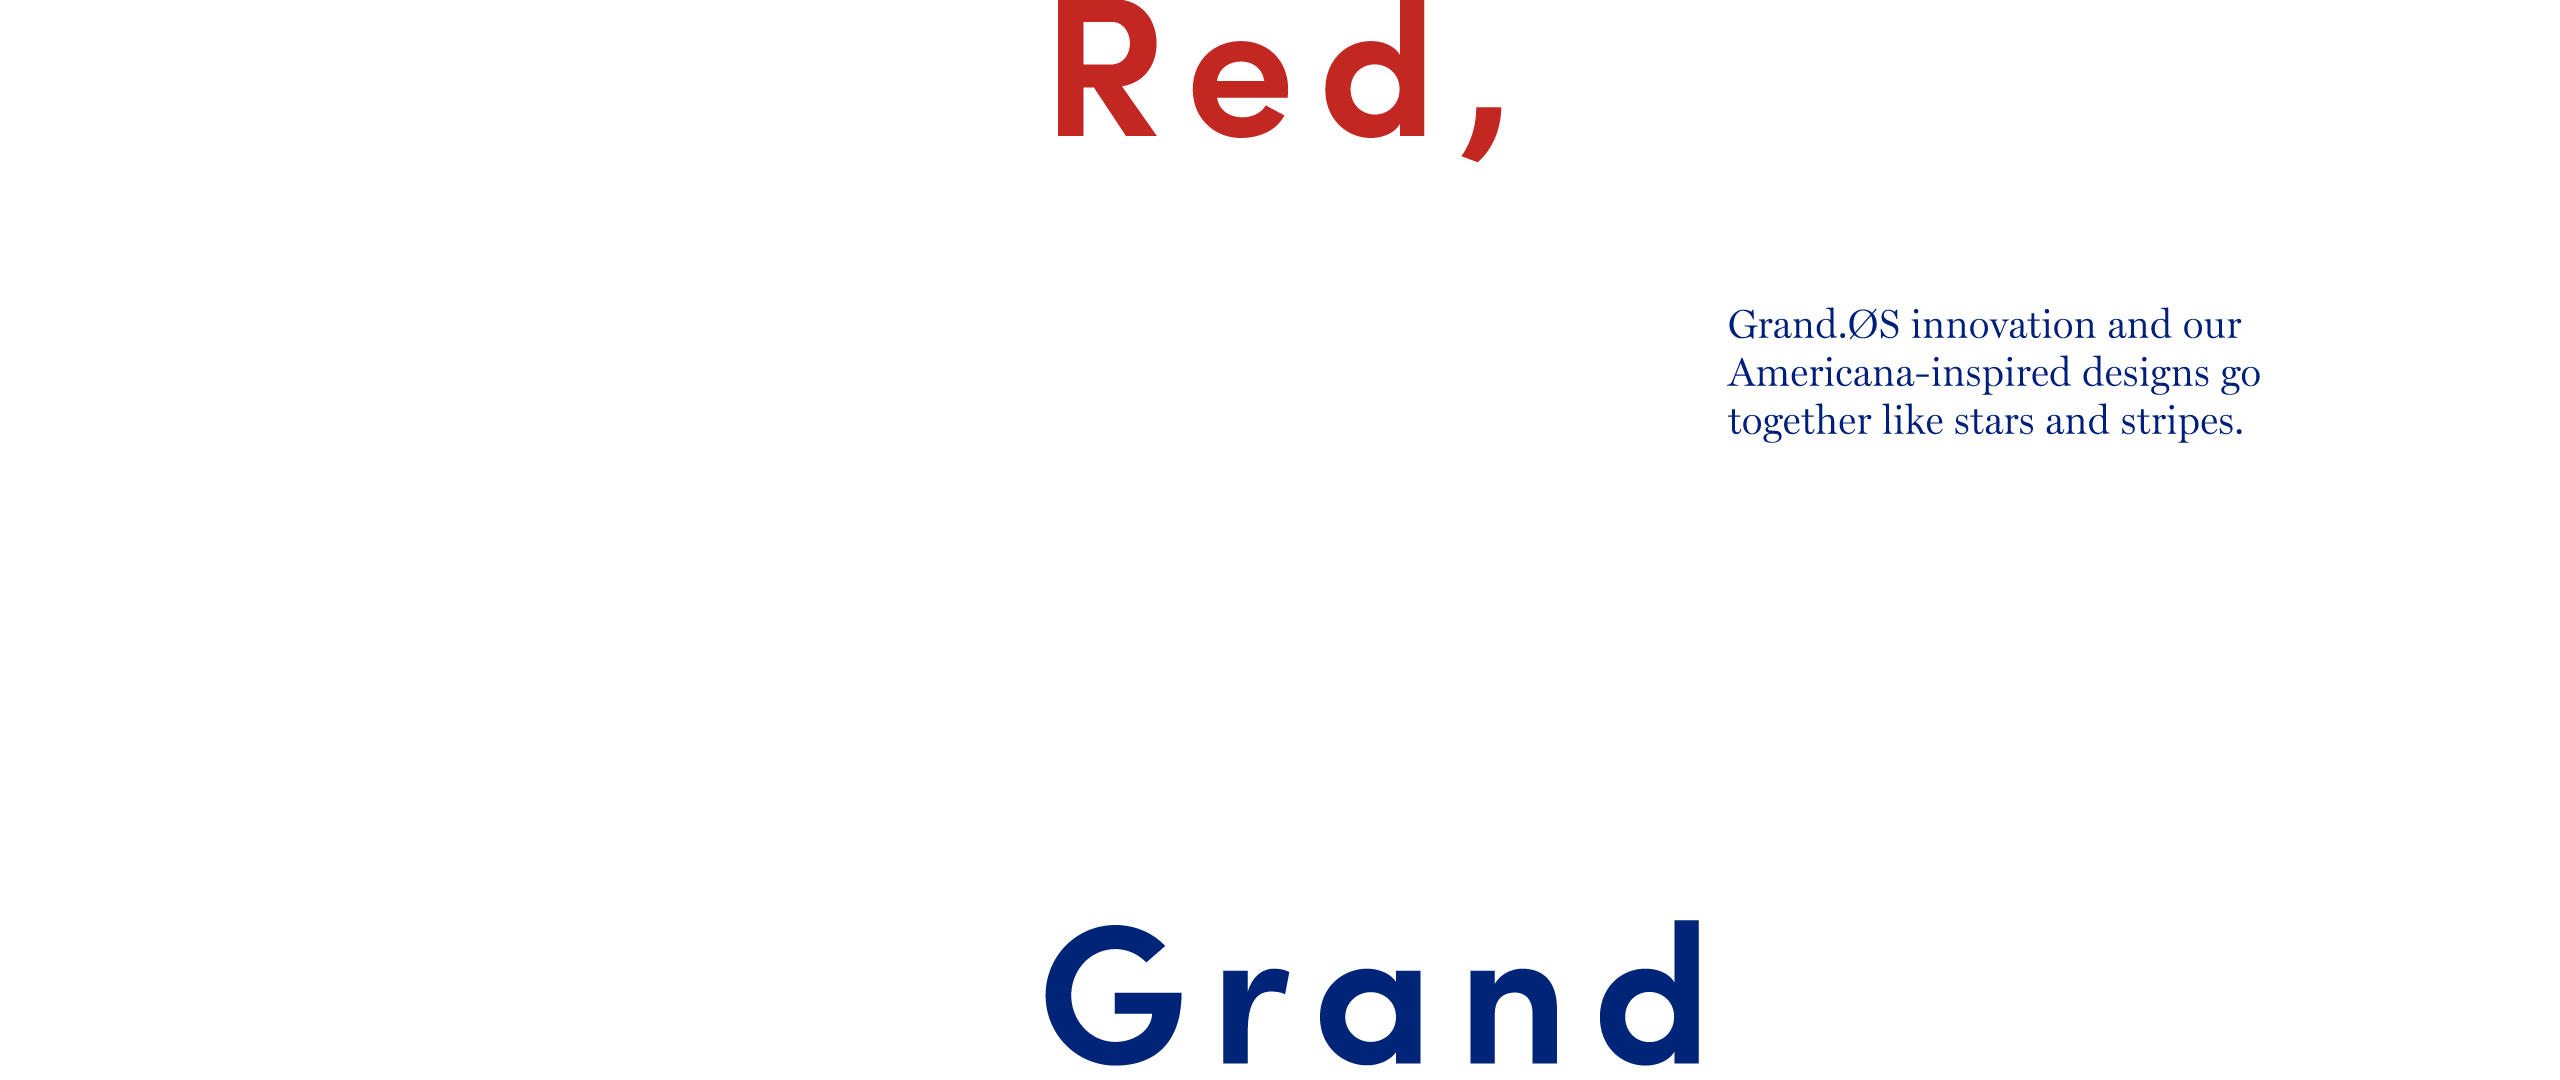 RED, WHITE & GRAND